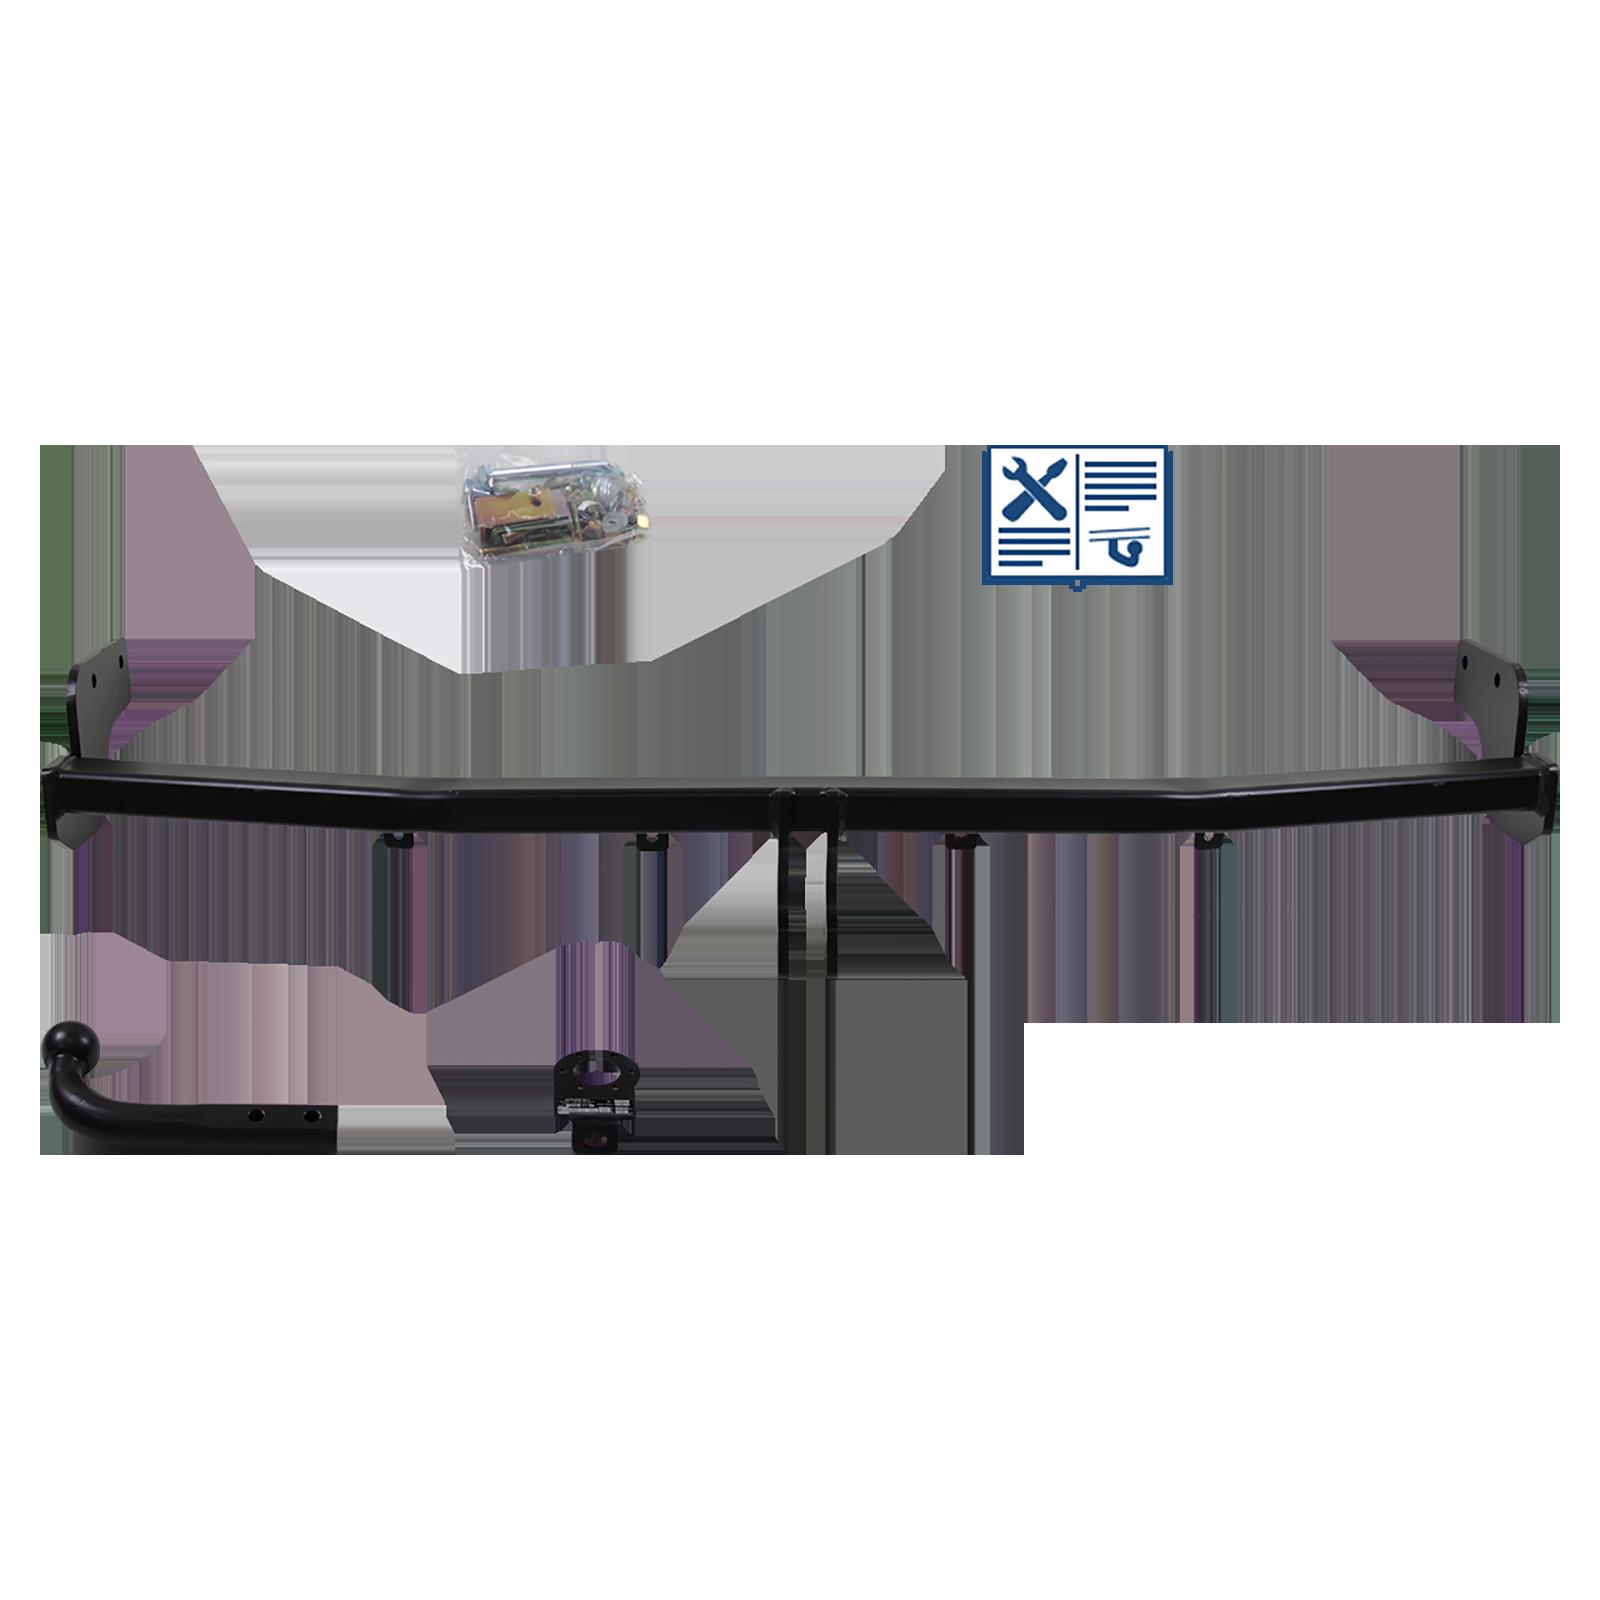 auto-hak towbar rigid incl  7 pin e-set